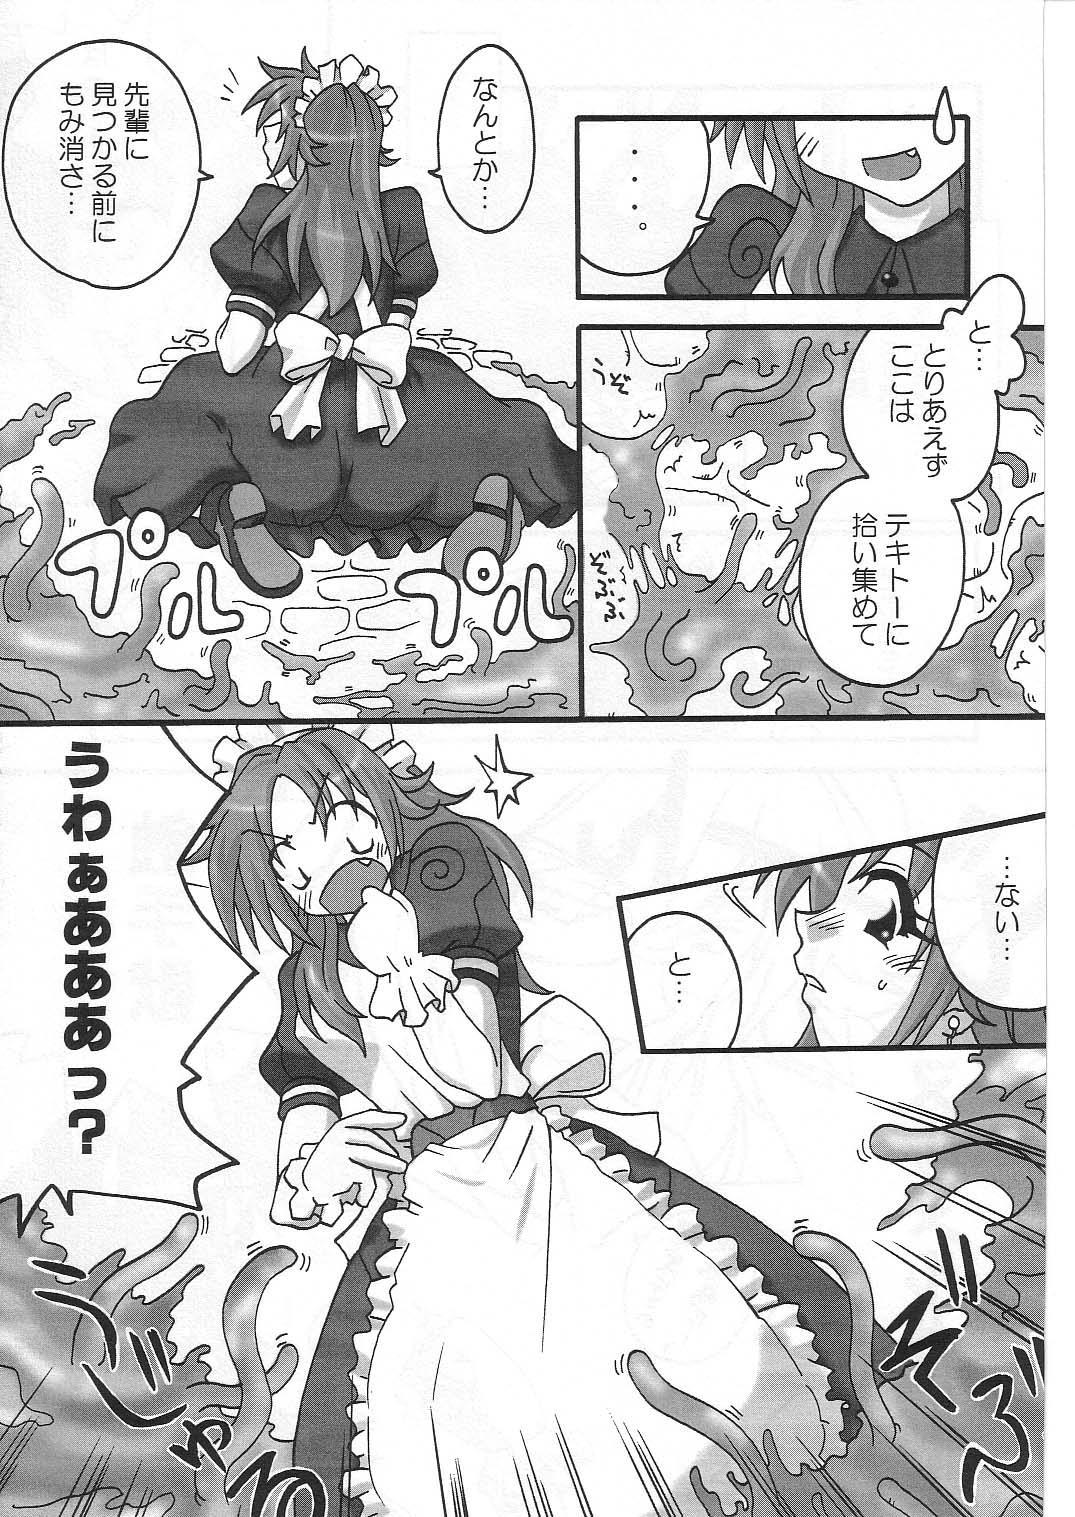 Kapura-san ga Koronda 8